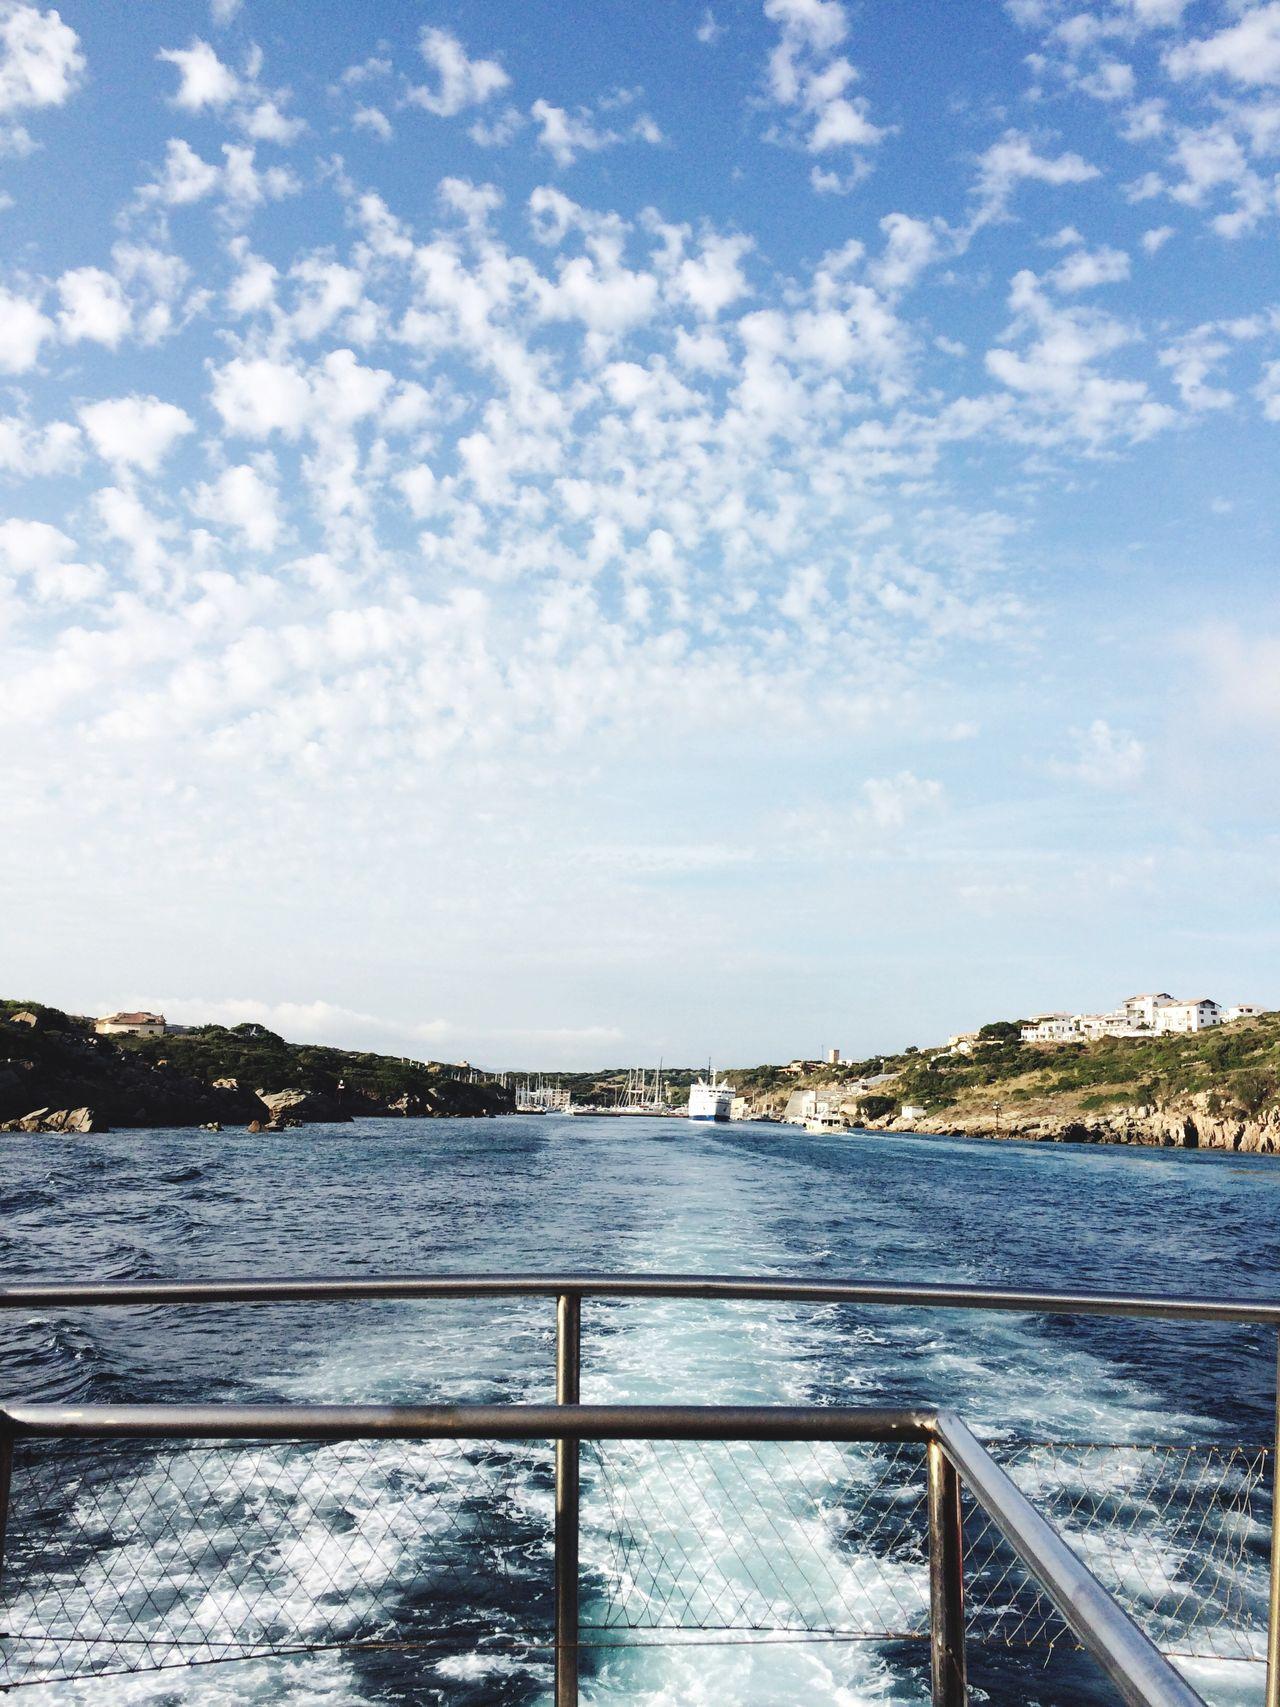 Mare Lamaddalena Sardegnamare Sardegnamylove Sardegna_super_pics Sardegnaofficial Sardegna Boat